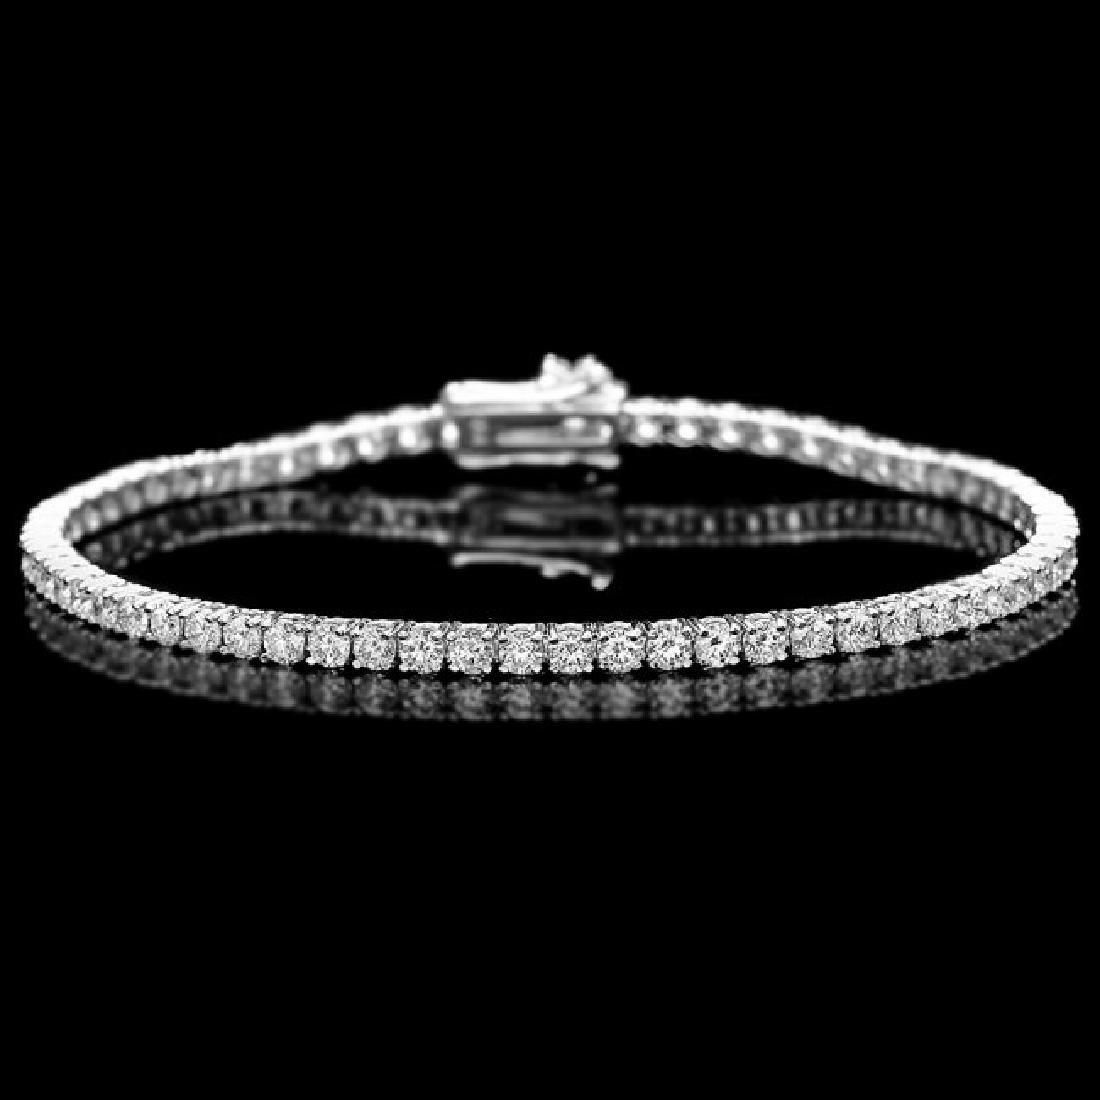 18k White Gold 4.45ct Diamond Bracelet